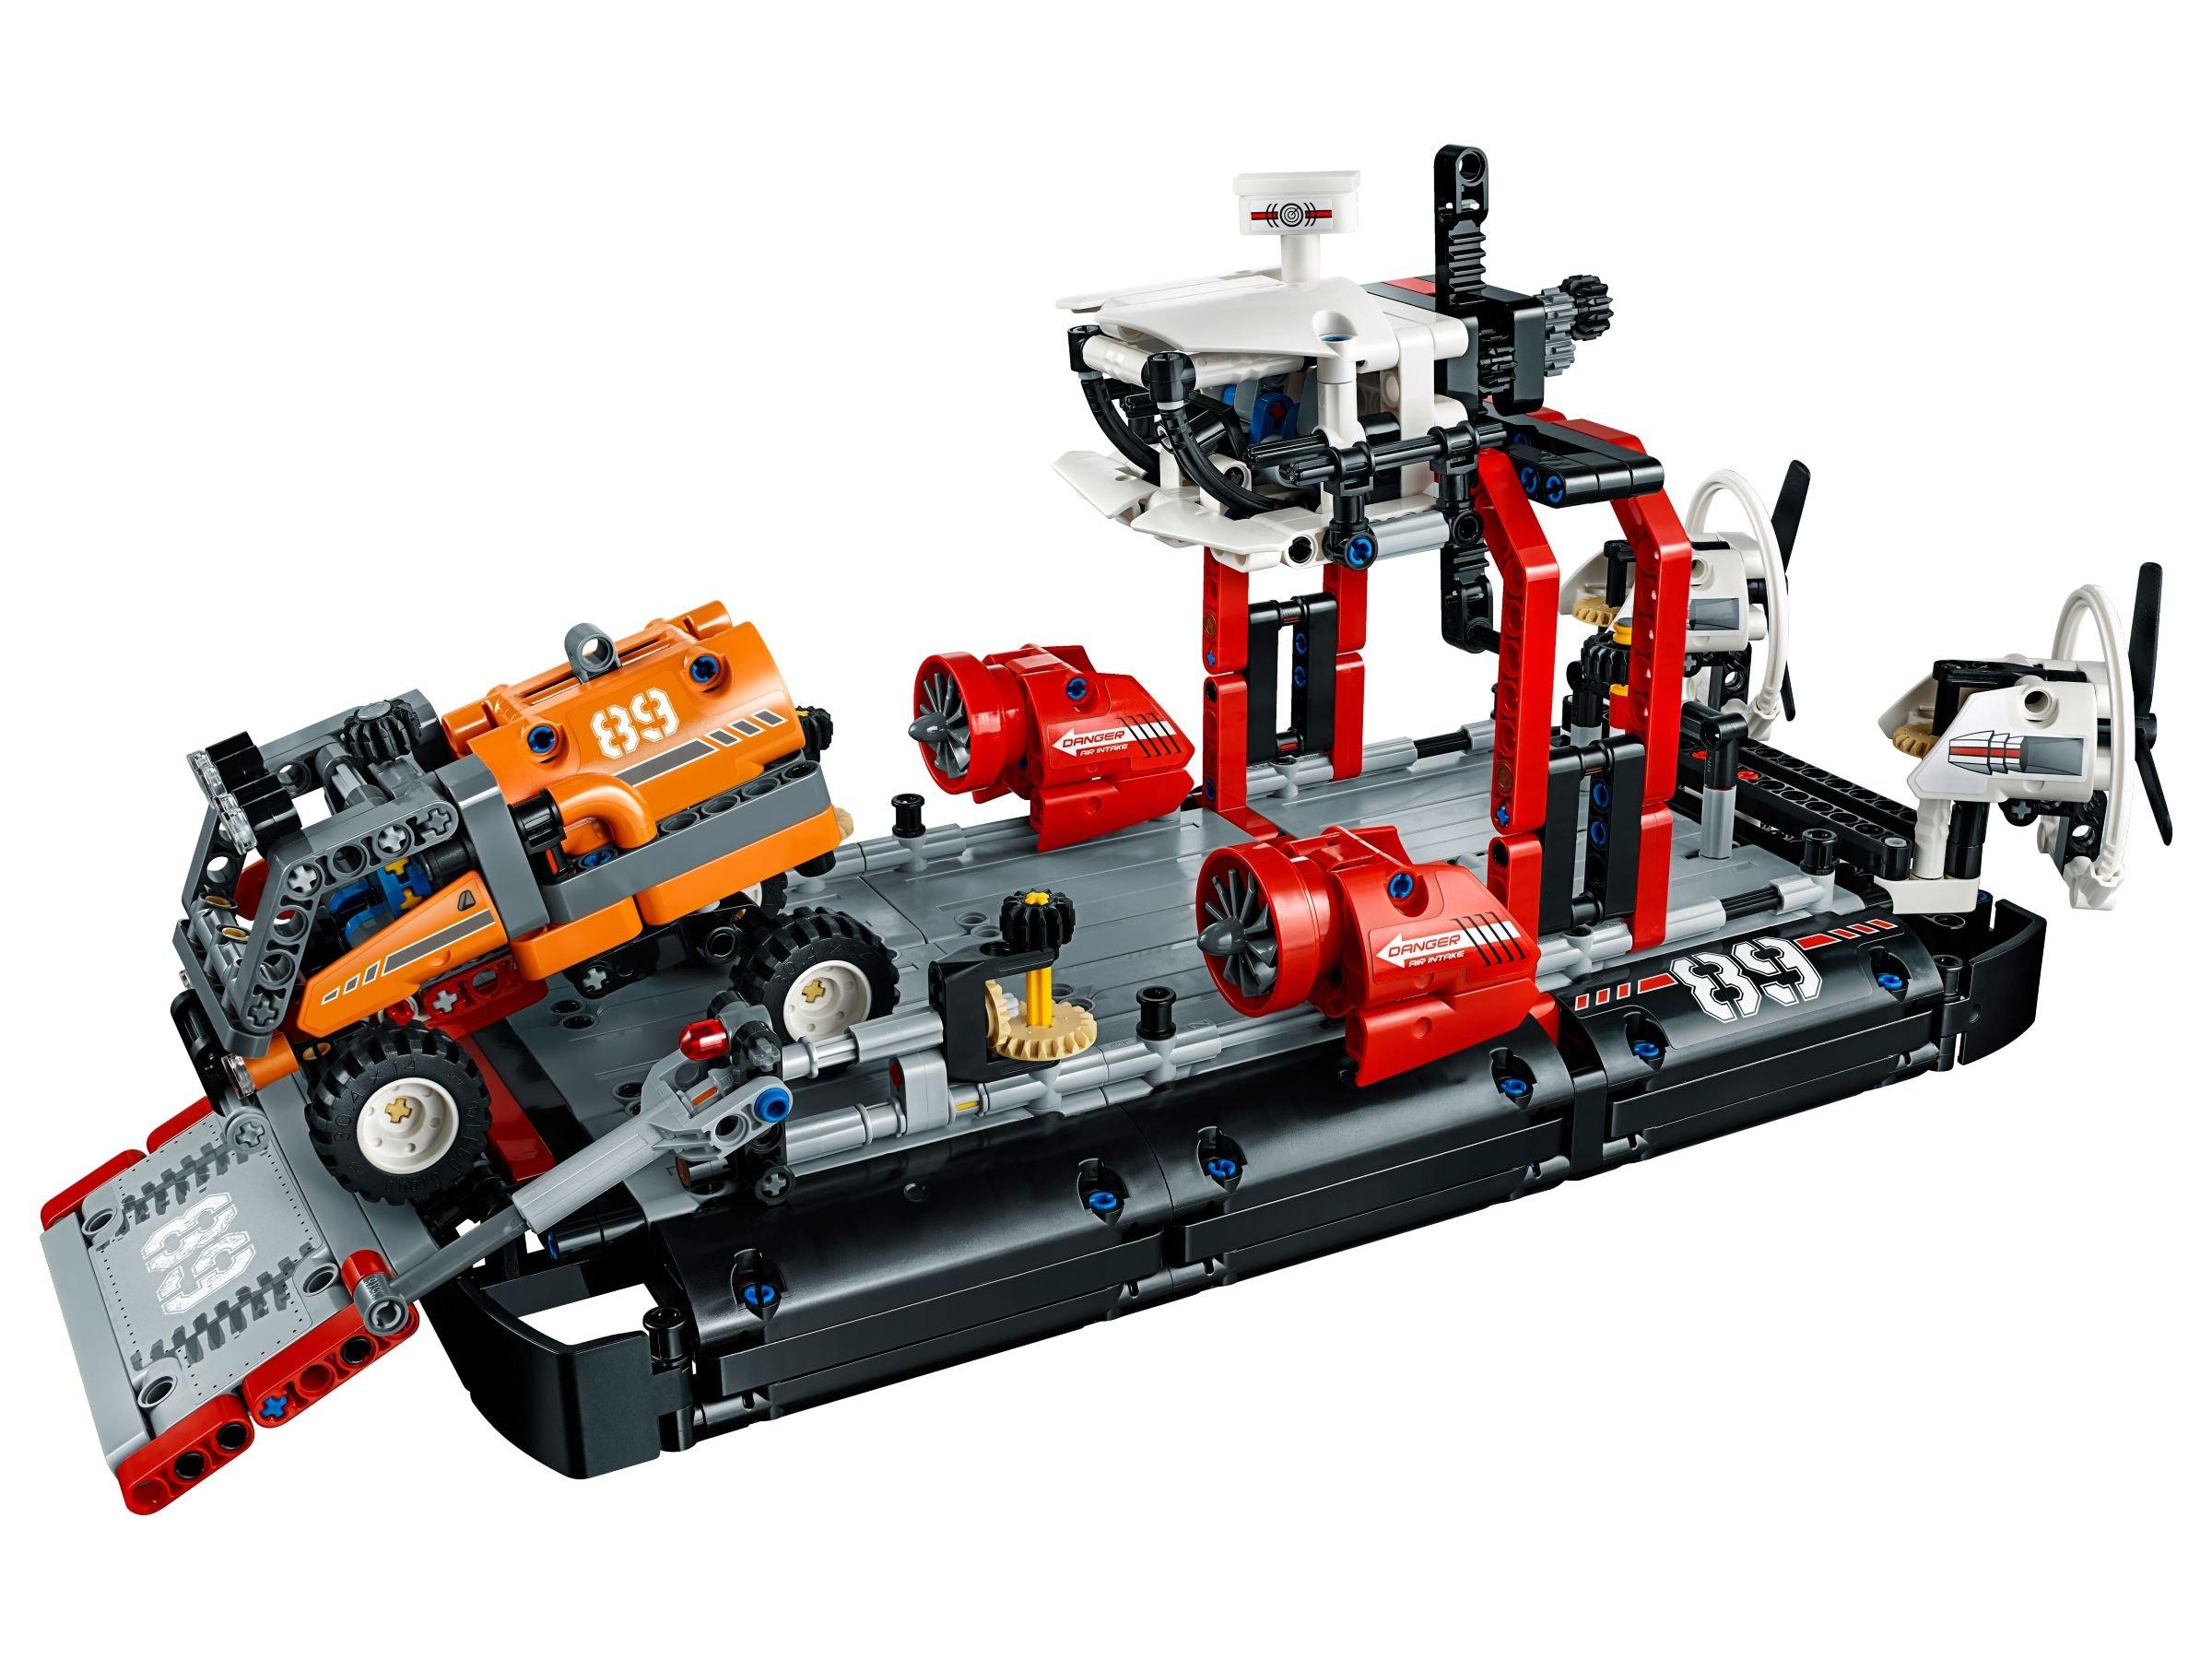 lego 42076 luftkissenboot technic 2018 ab 52 77 25 gespart hovercraft brickmerge. Black Bedroom Furniture Sets. Home Design Ideas